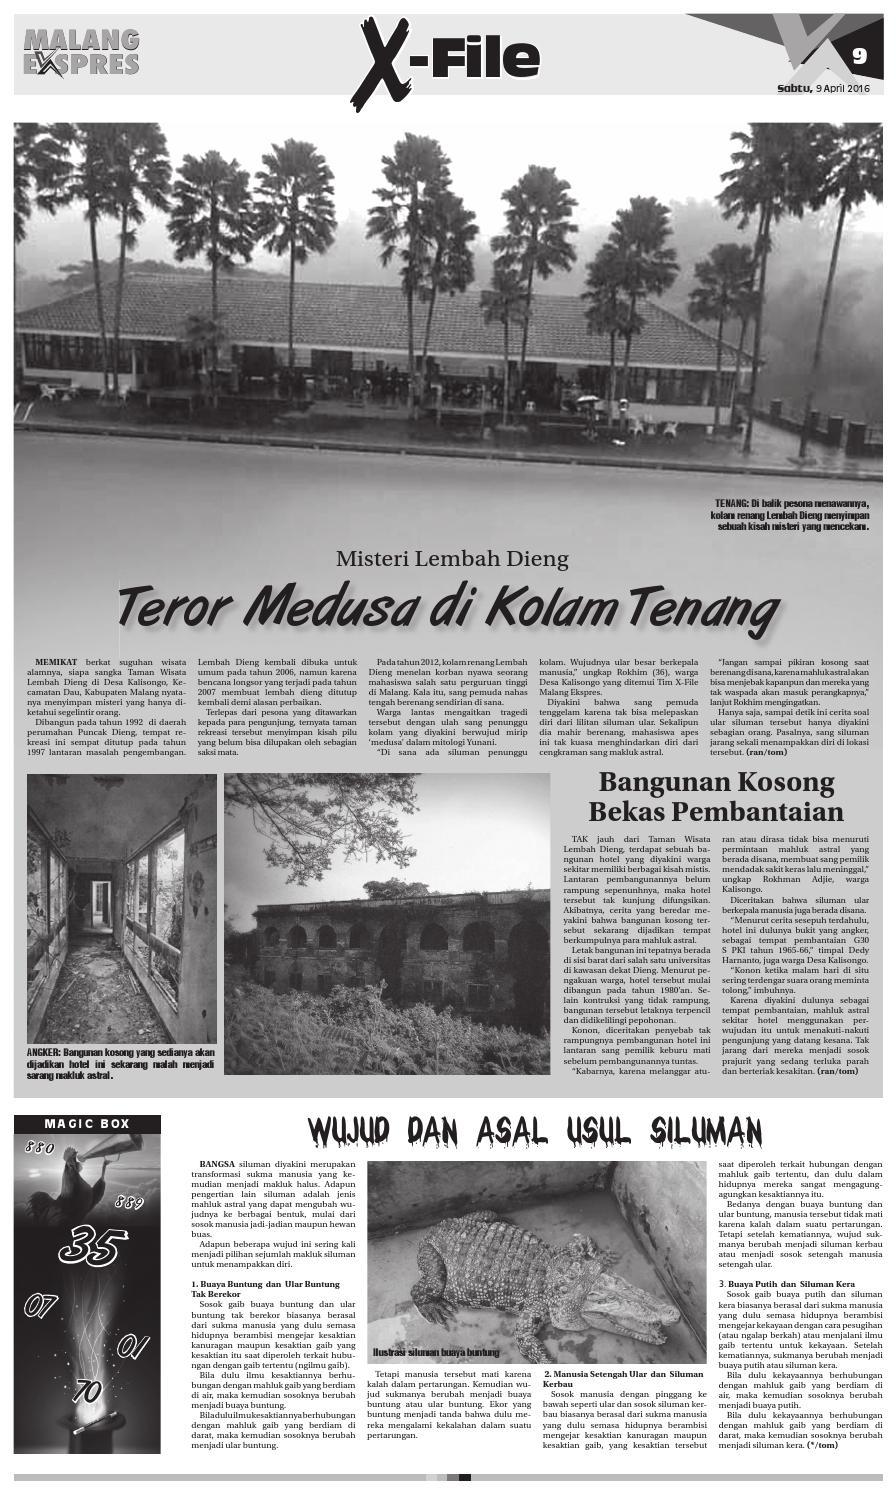 Lembah Dieng Malang : lembah, dieng, malang, Tempat, Wisata, Rekreasi, Indonesia, 💕:, Lembah, Dieng, Malang